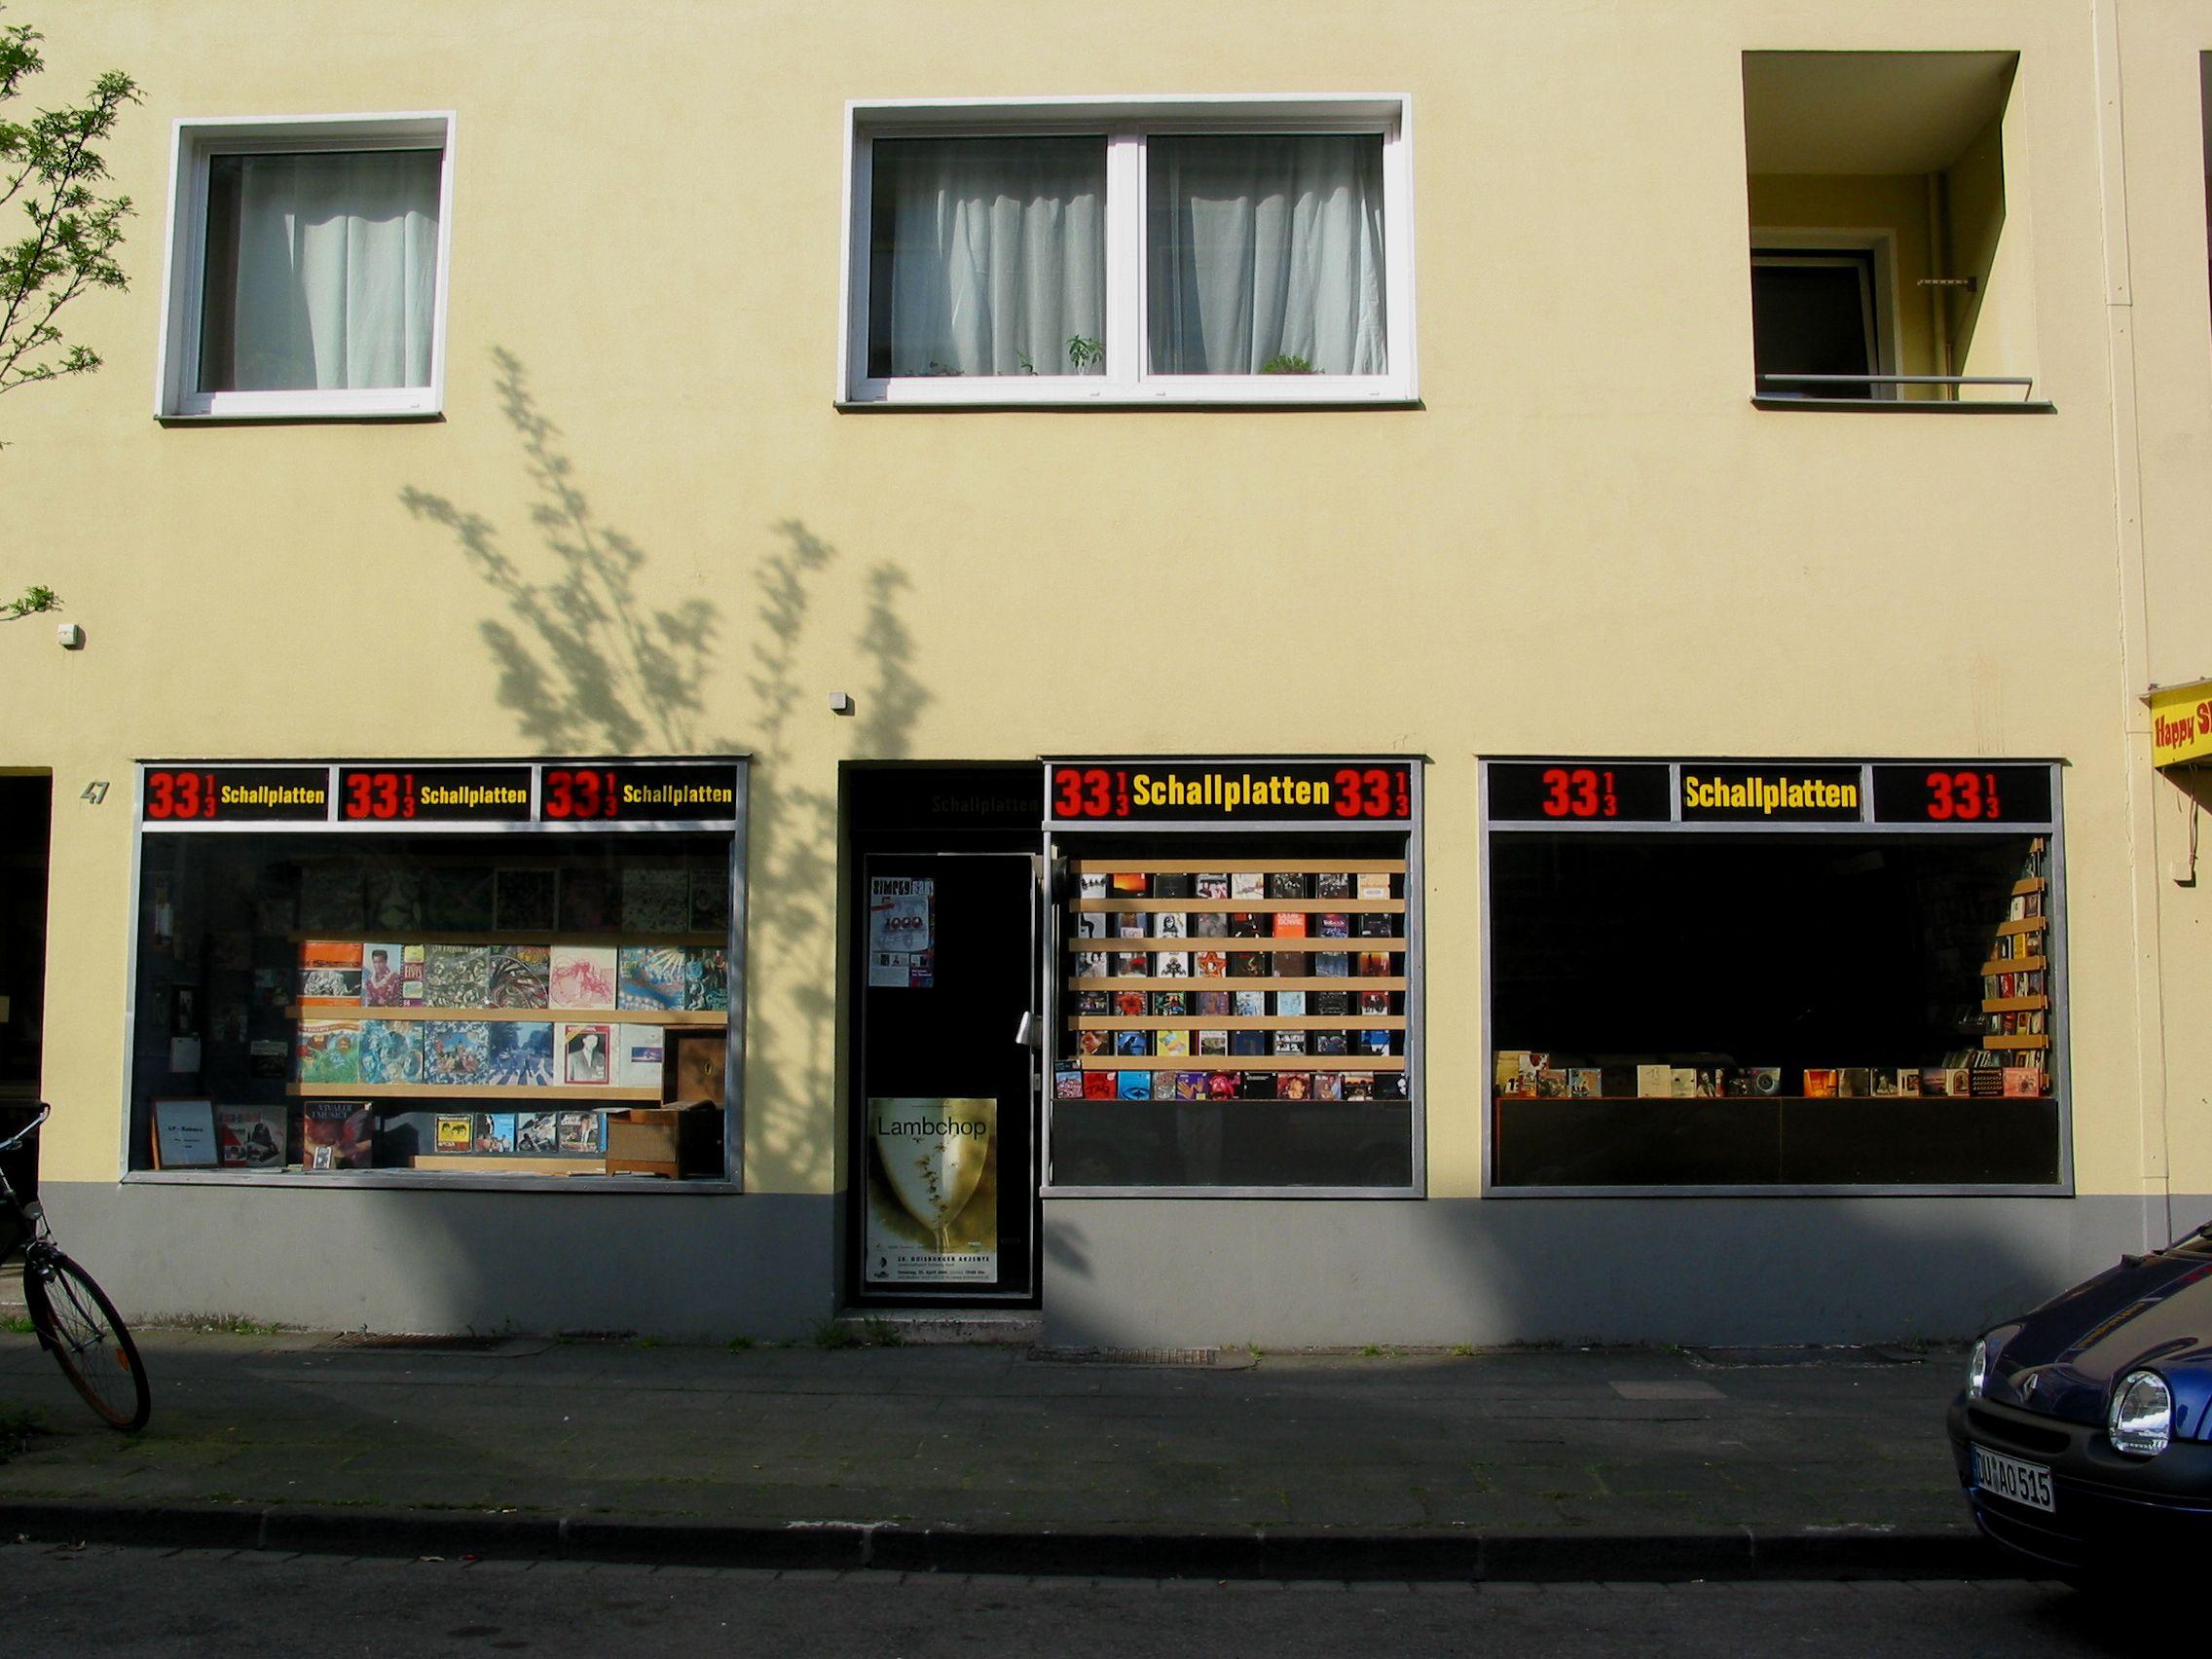 33 1/3 Schallplatten